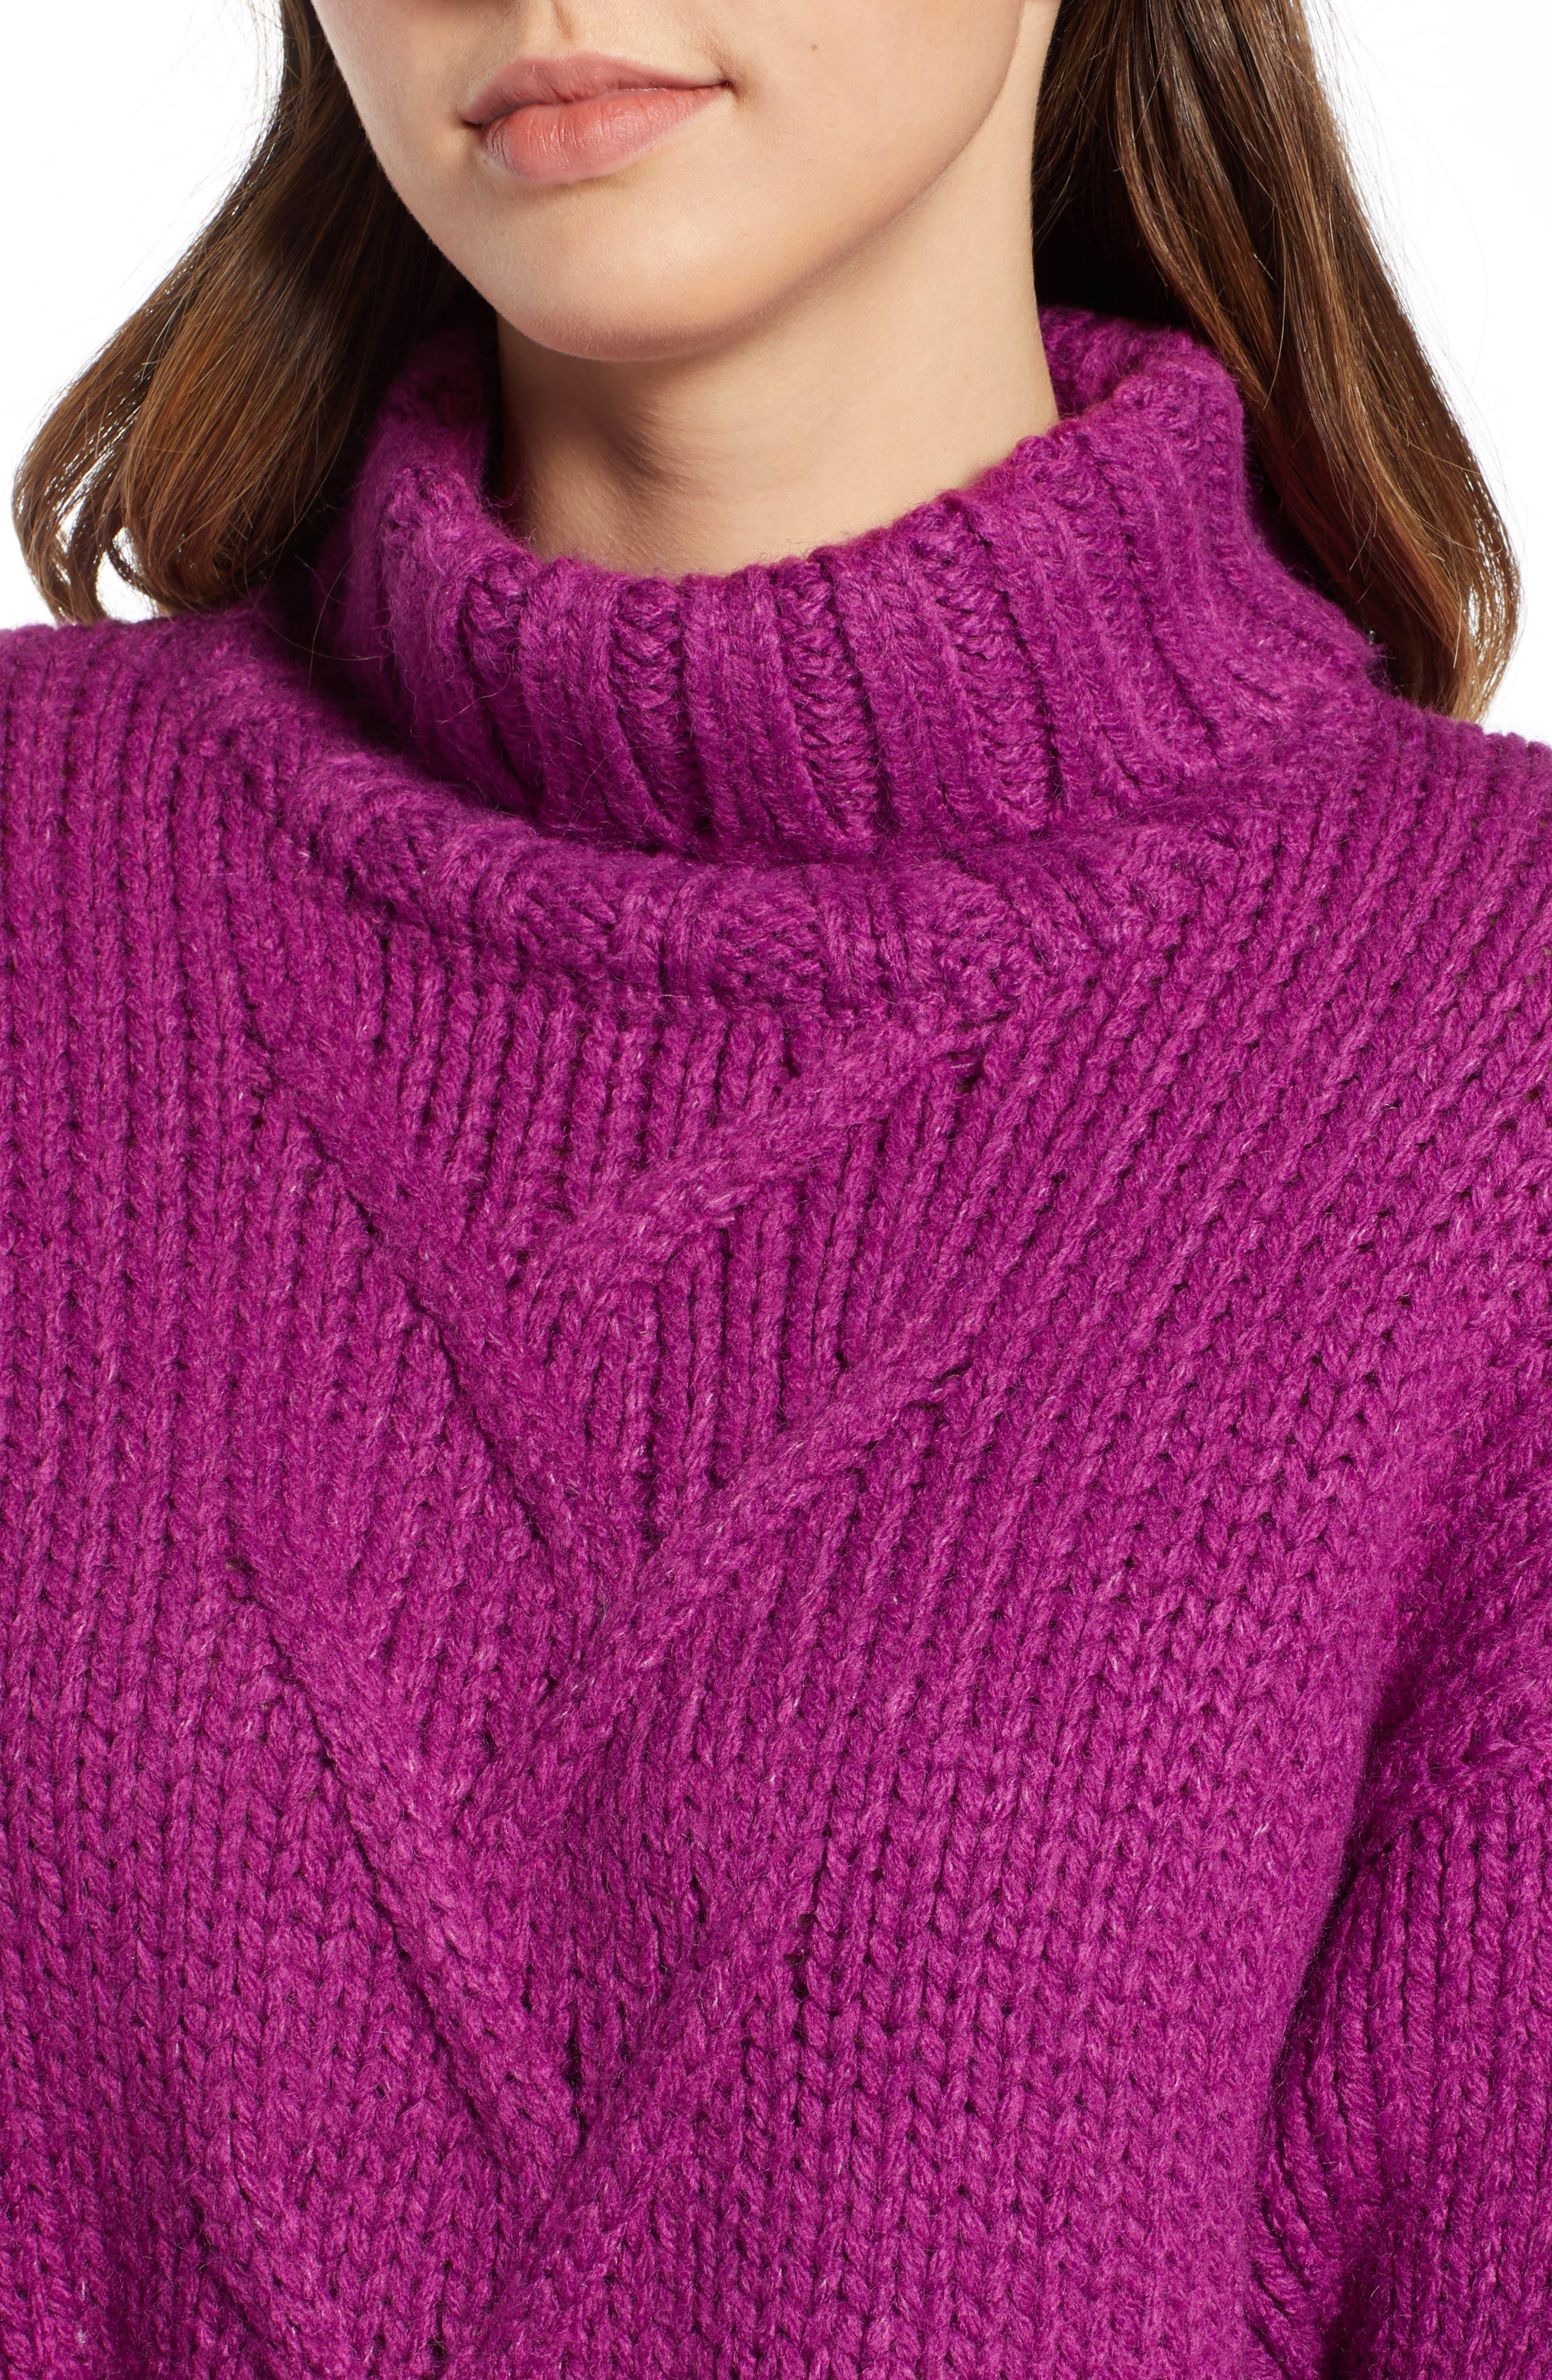 Kira Turtleneck Sweater,                             Alternate thumbnail 4, color,                             HOLLYHOCK